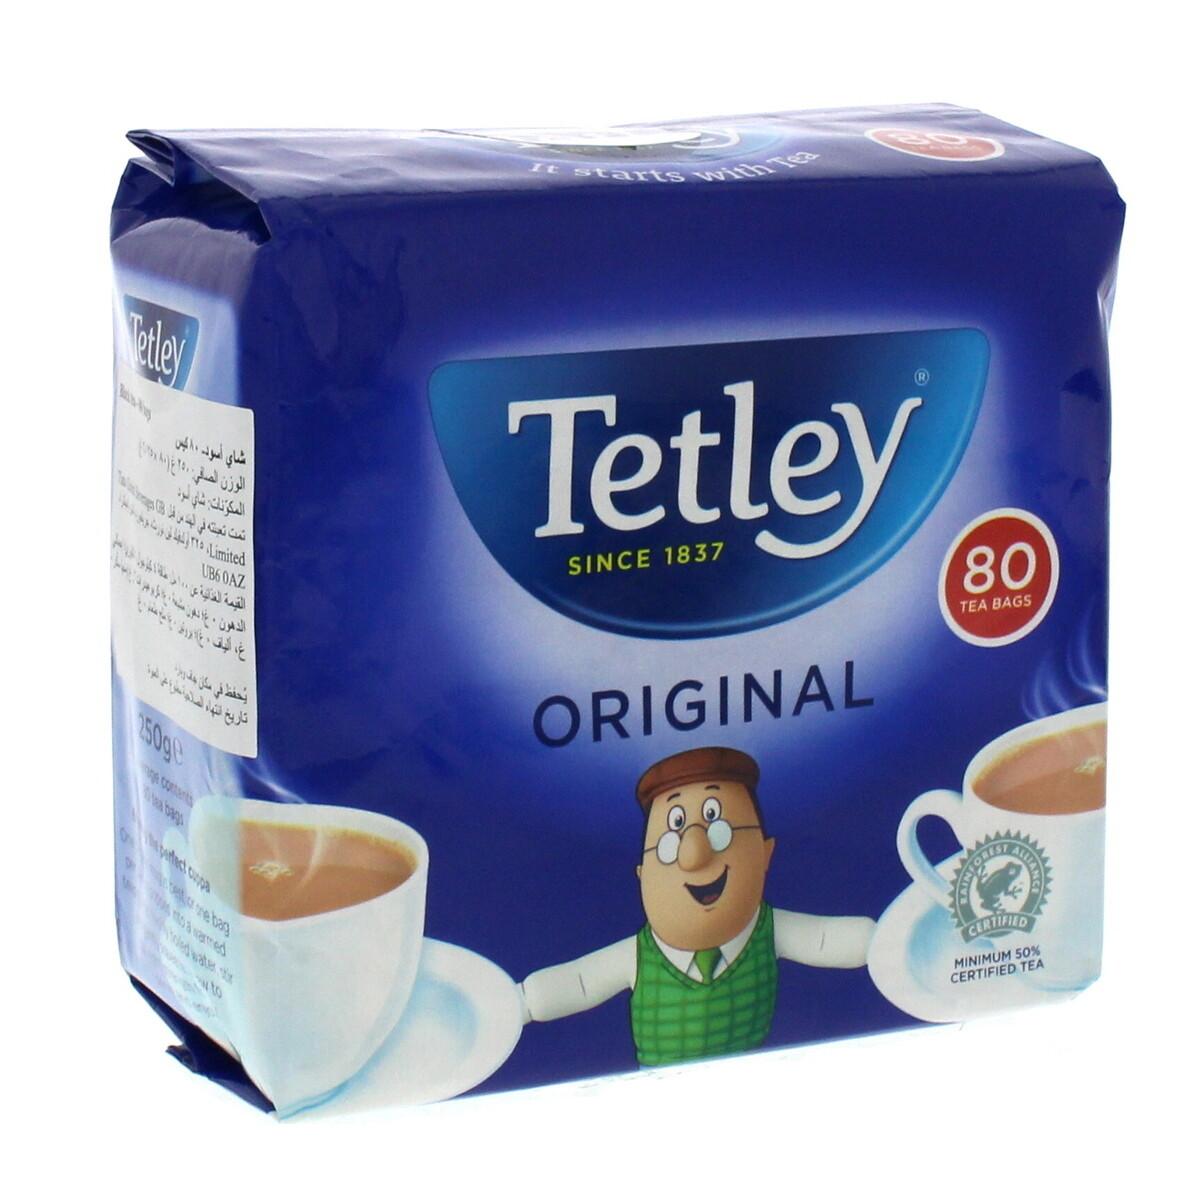 TETLEY TEA BAGS 80s